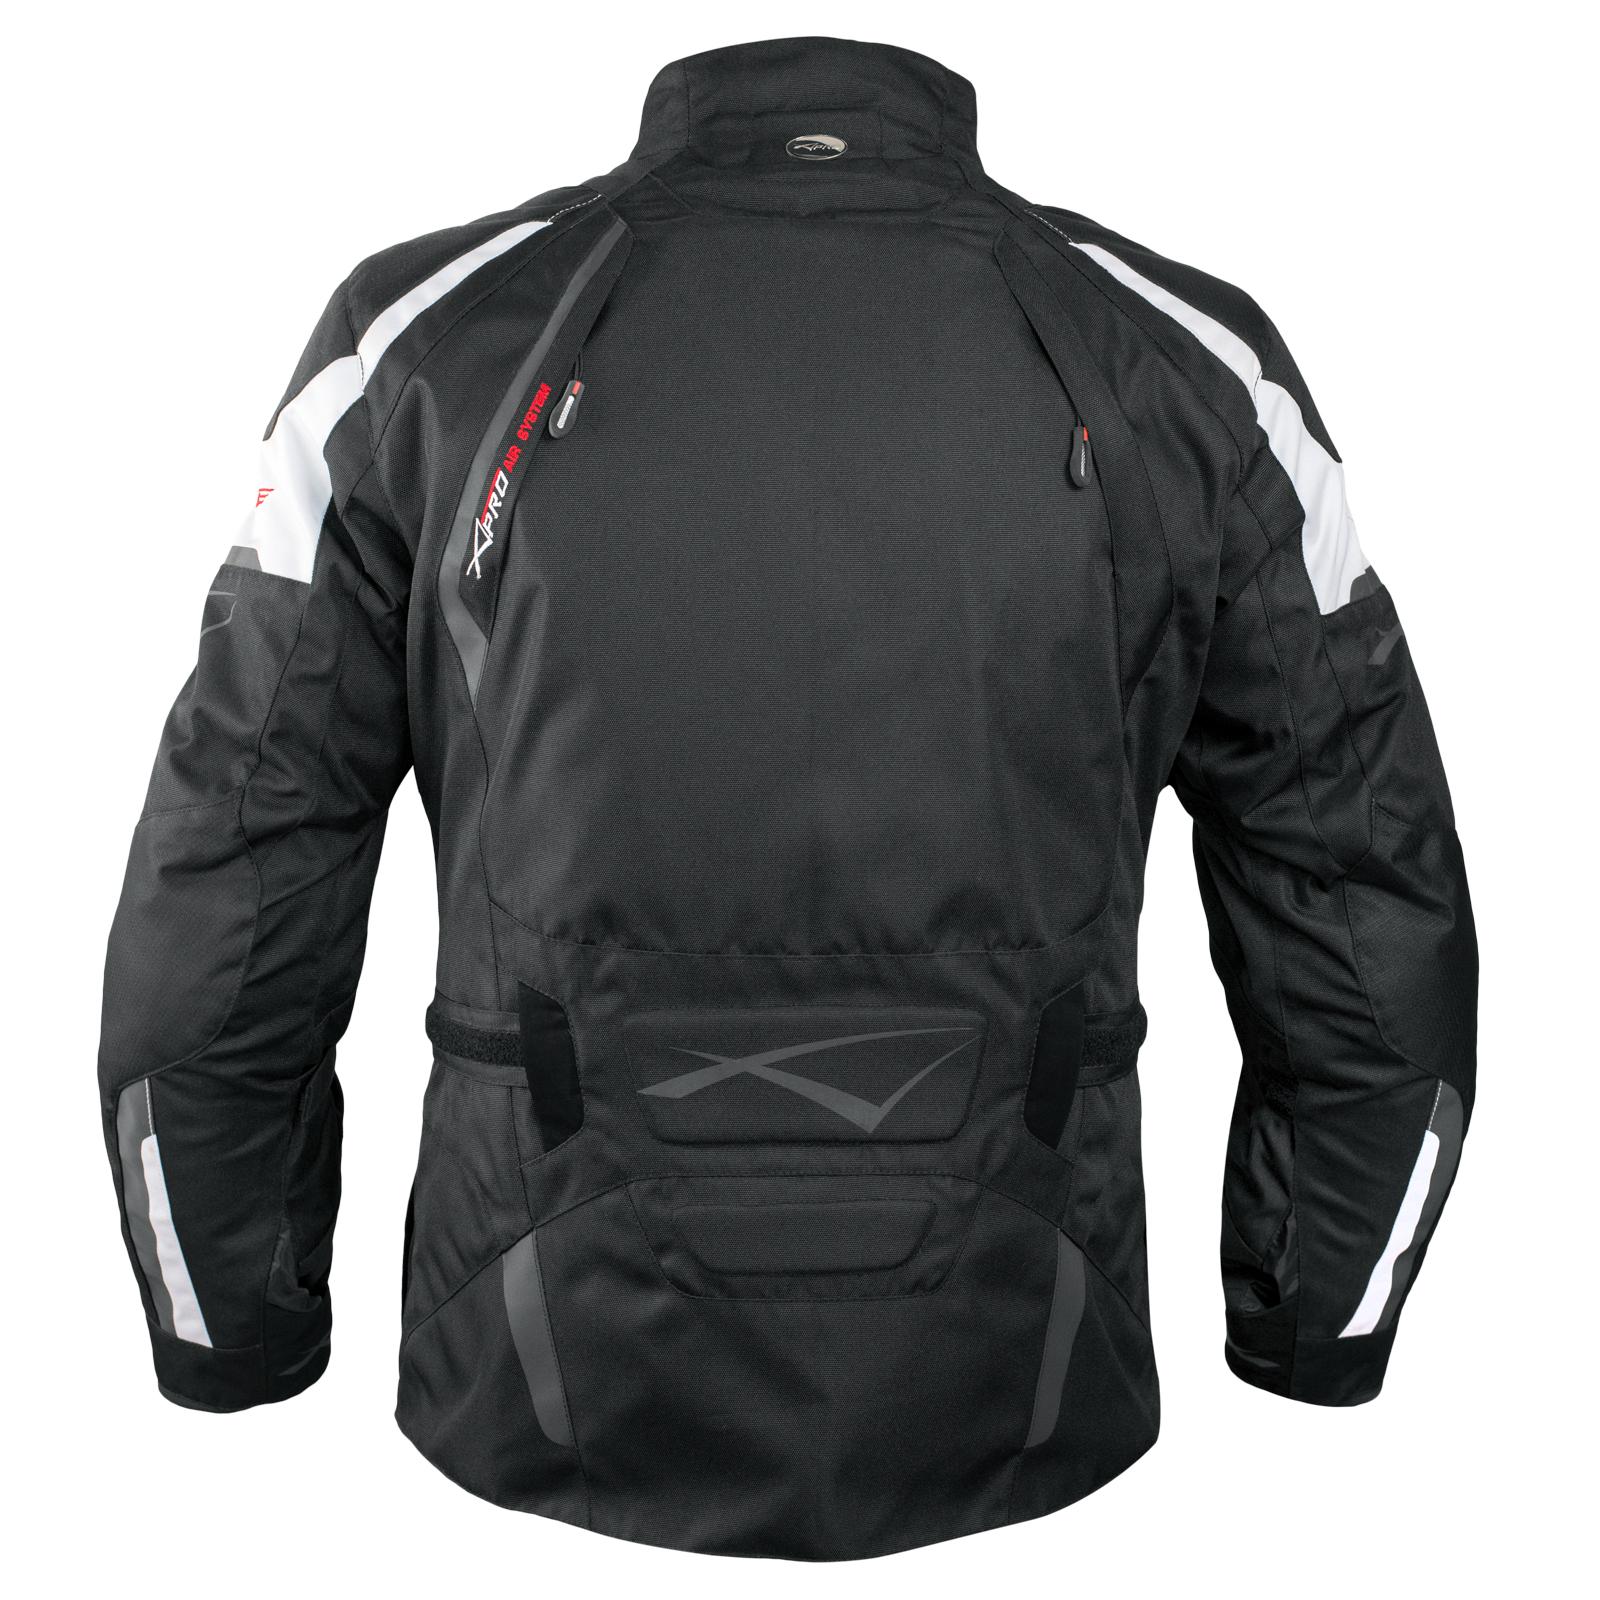 Enduro-Giacca-Moto-Turismo-Touring-Off-Road-Cordura-Impermeabile-Bianco